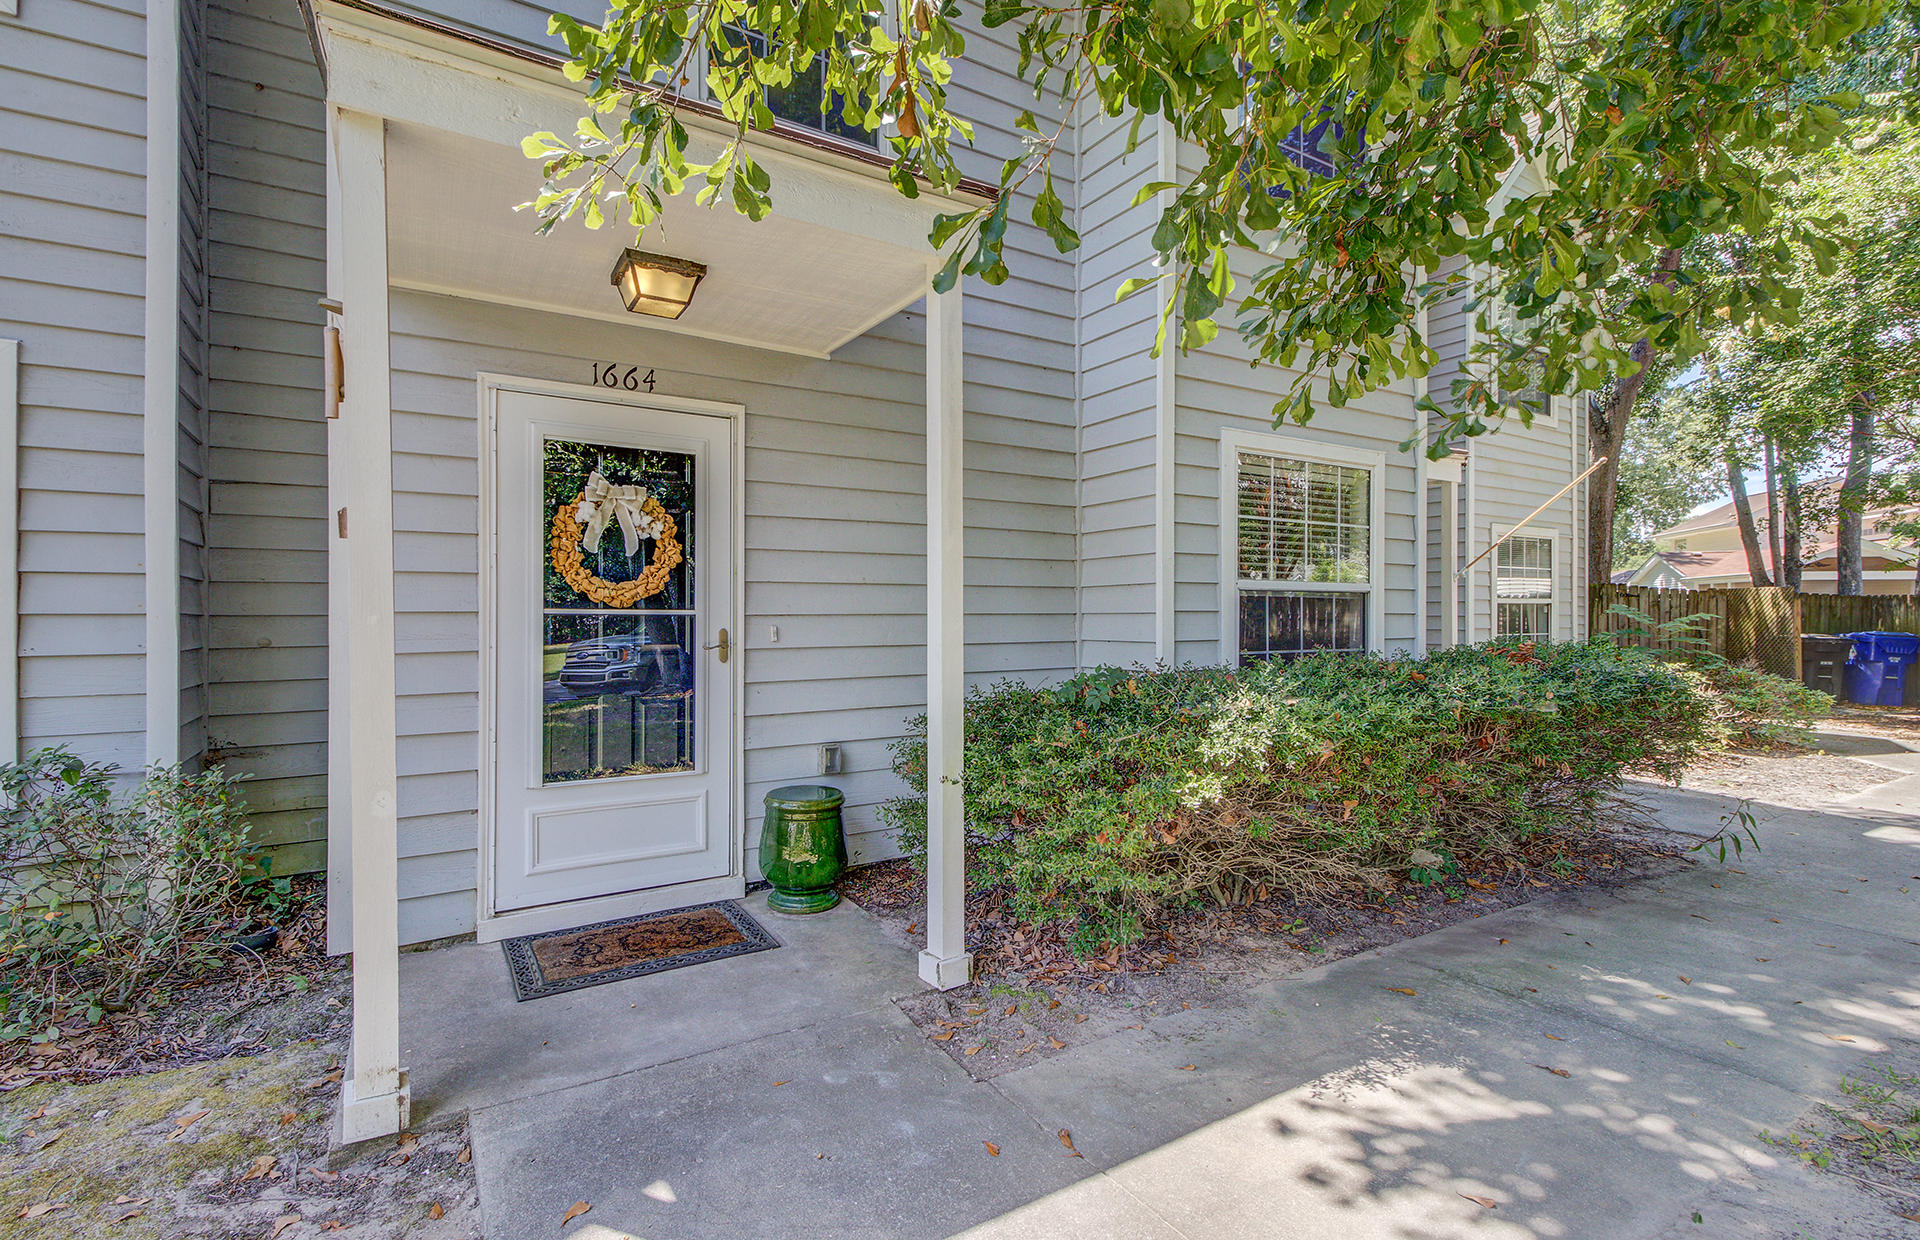 Wando East Homes For Sale - 1664 Hunters Run, Mount Pleasant, SC - 26